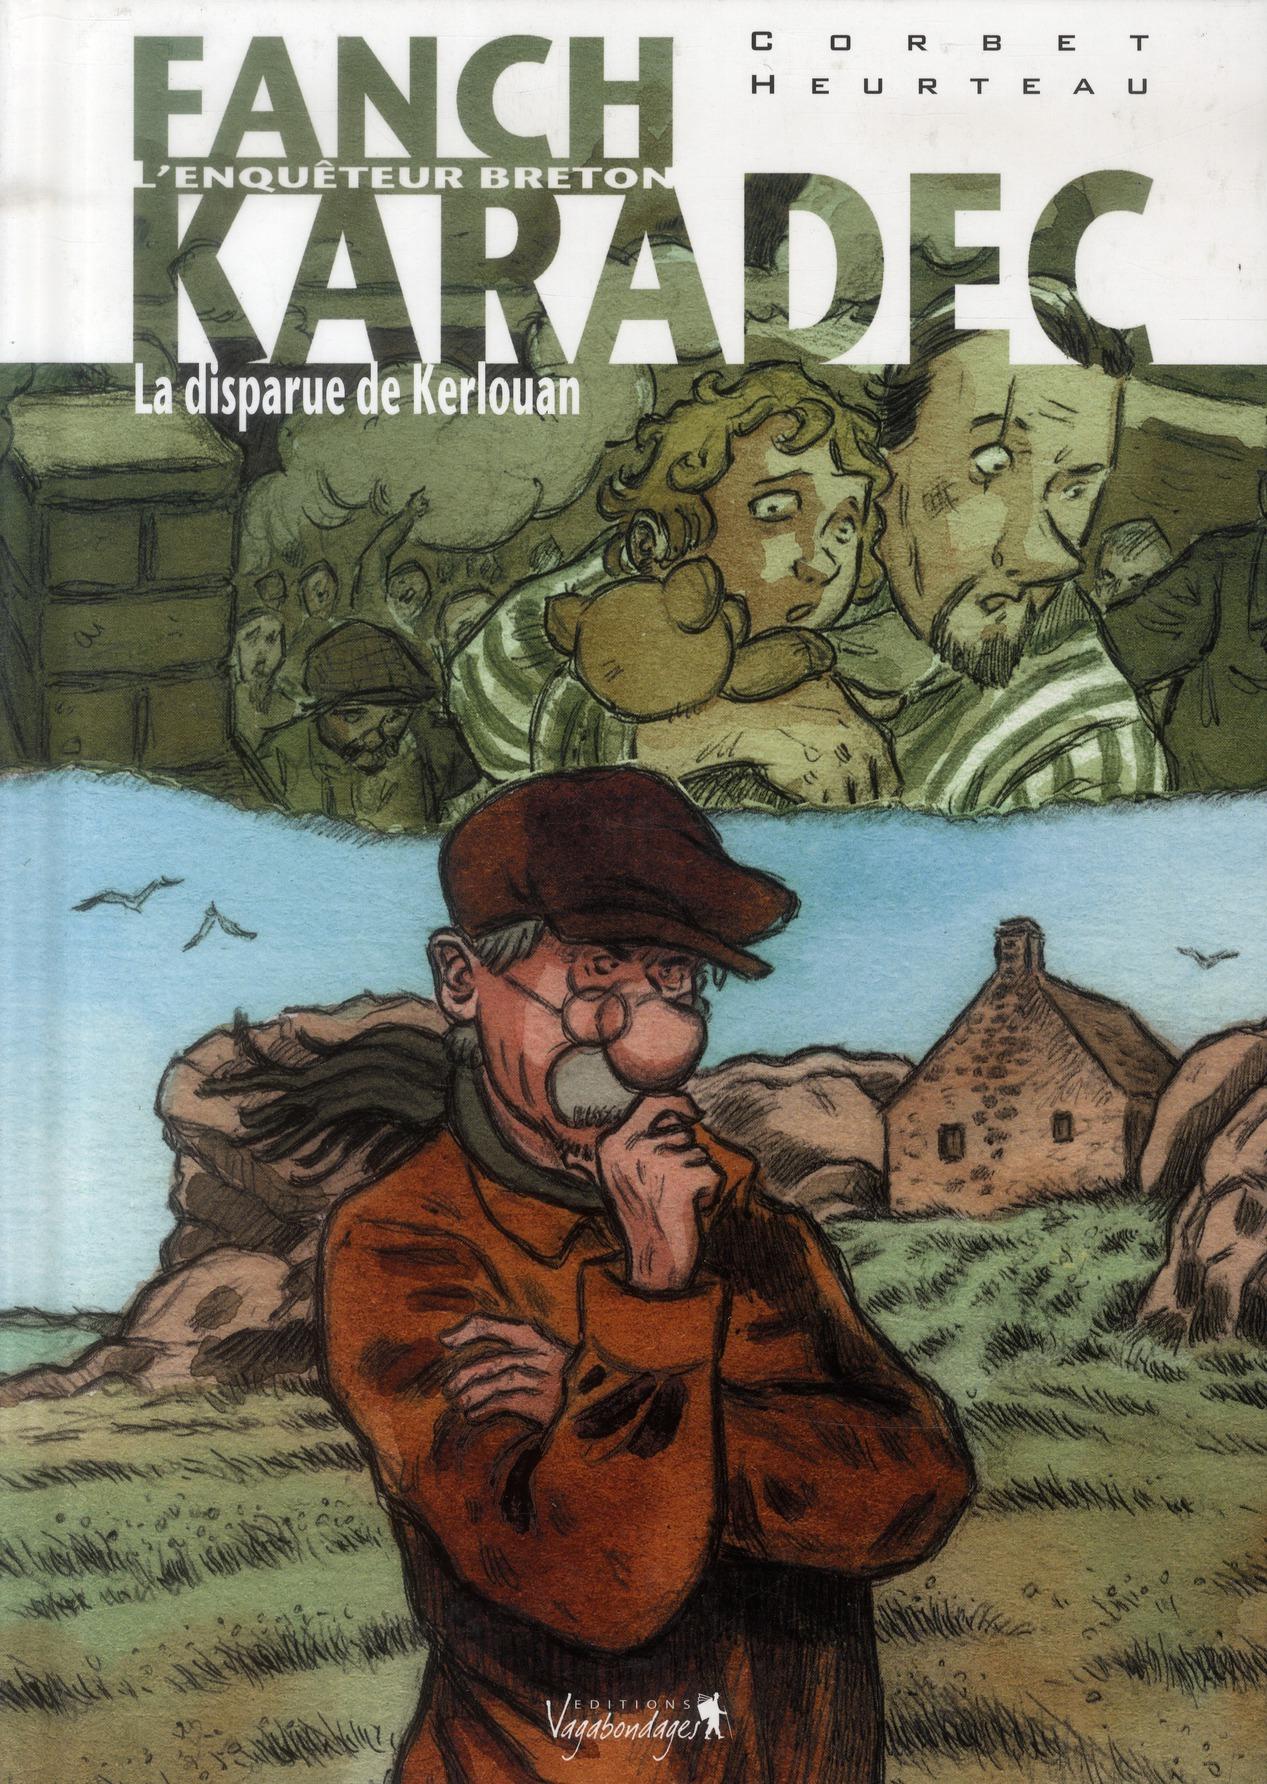 FANCH KARADEC T03 LA DISPARUE DE KERLOUAN Corbet S